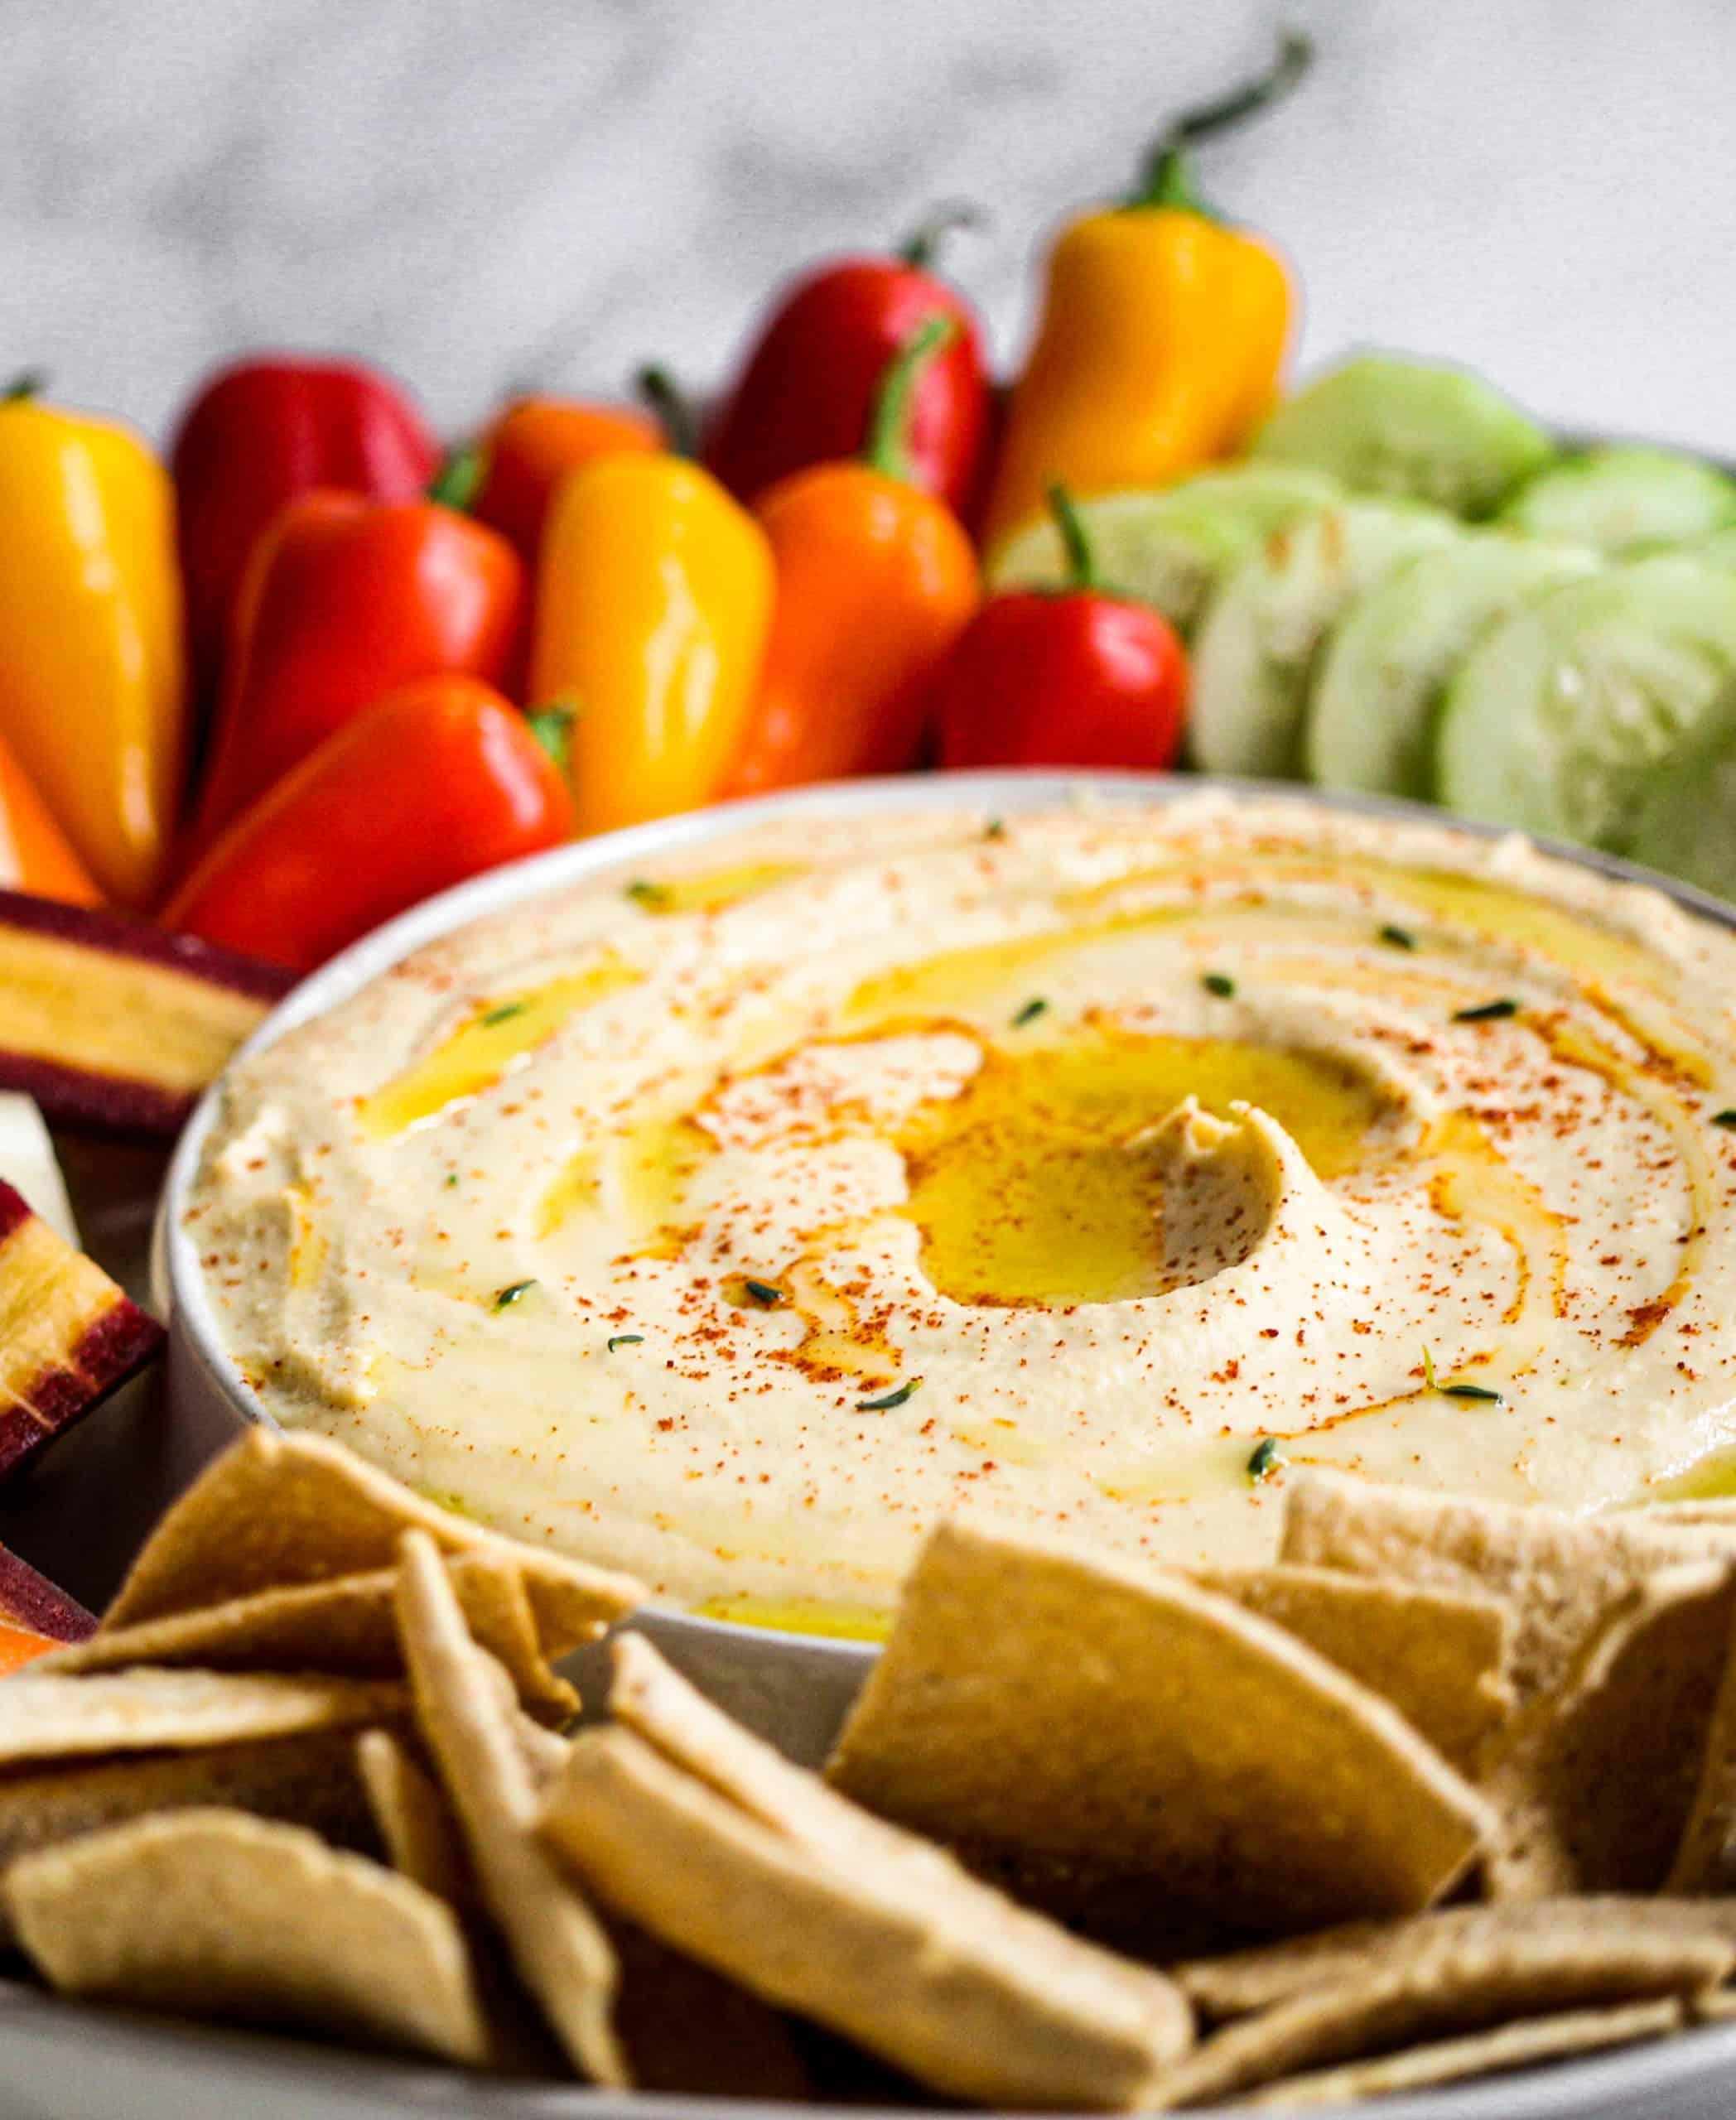 Creamiest Two-Bean Hummus